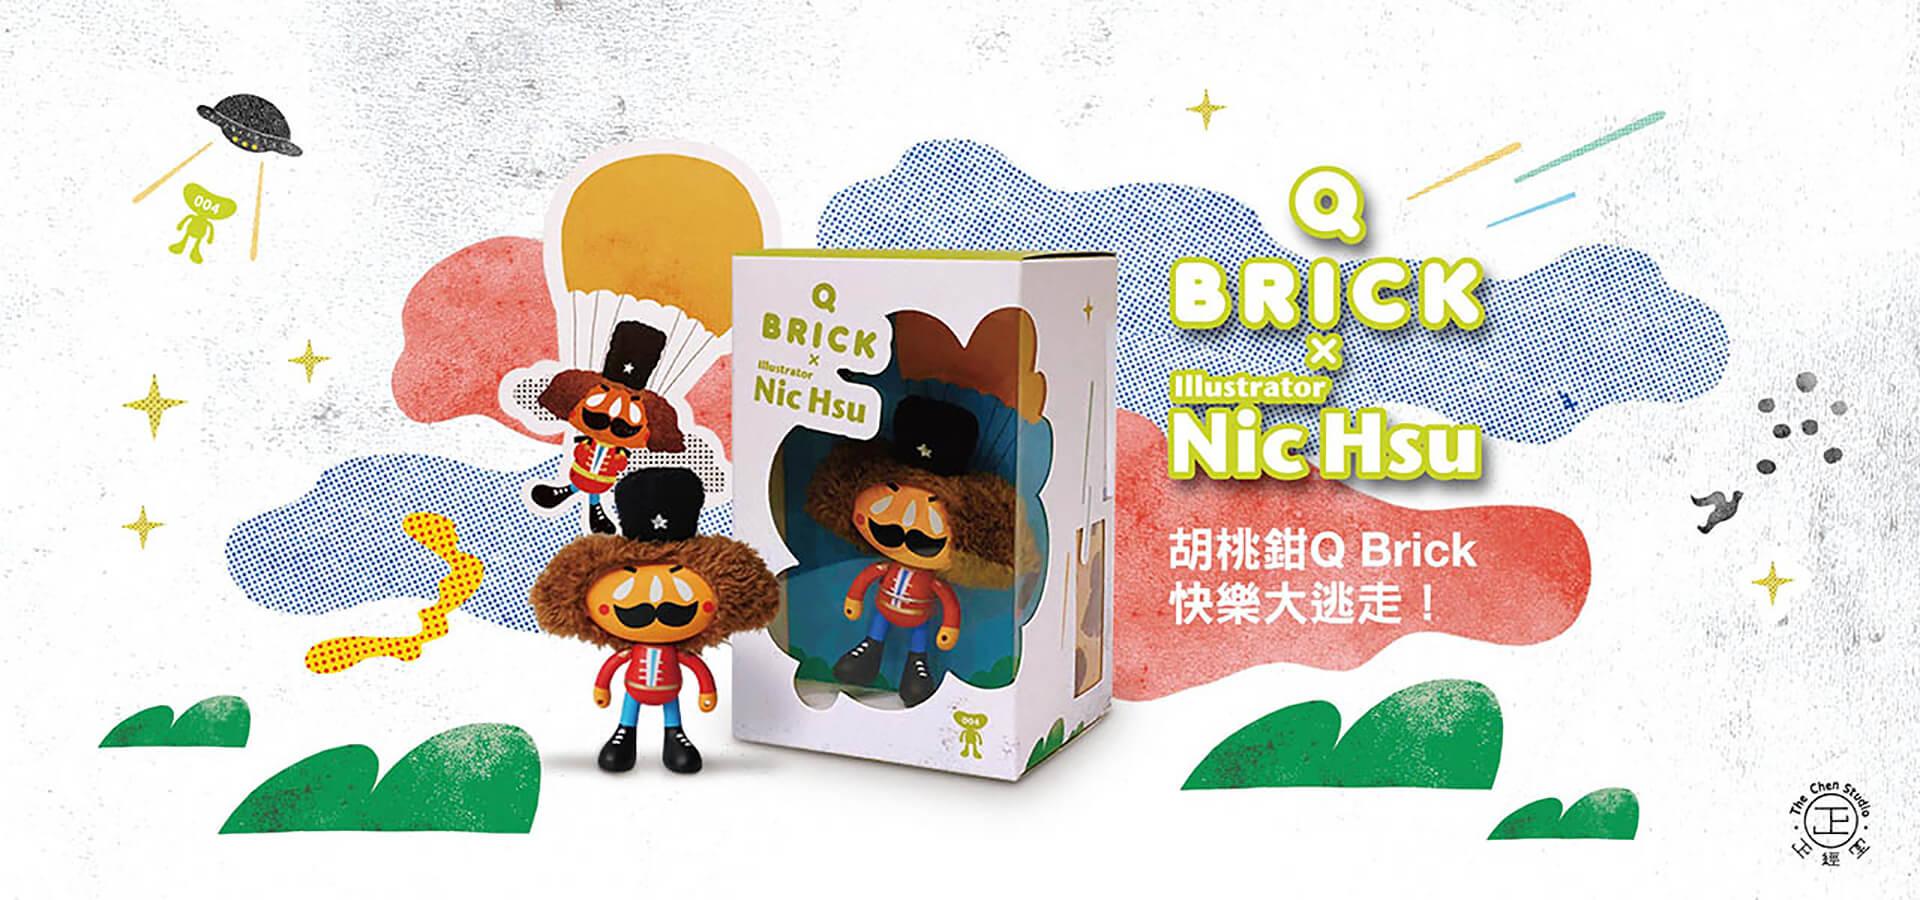 Q Brick X Nic Hsu 徐世賢 「有一點點超現實,有一點點脫離日常」的退休胡桃鉗士兵